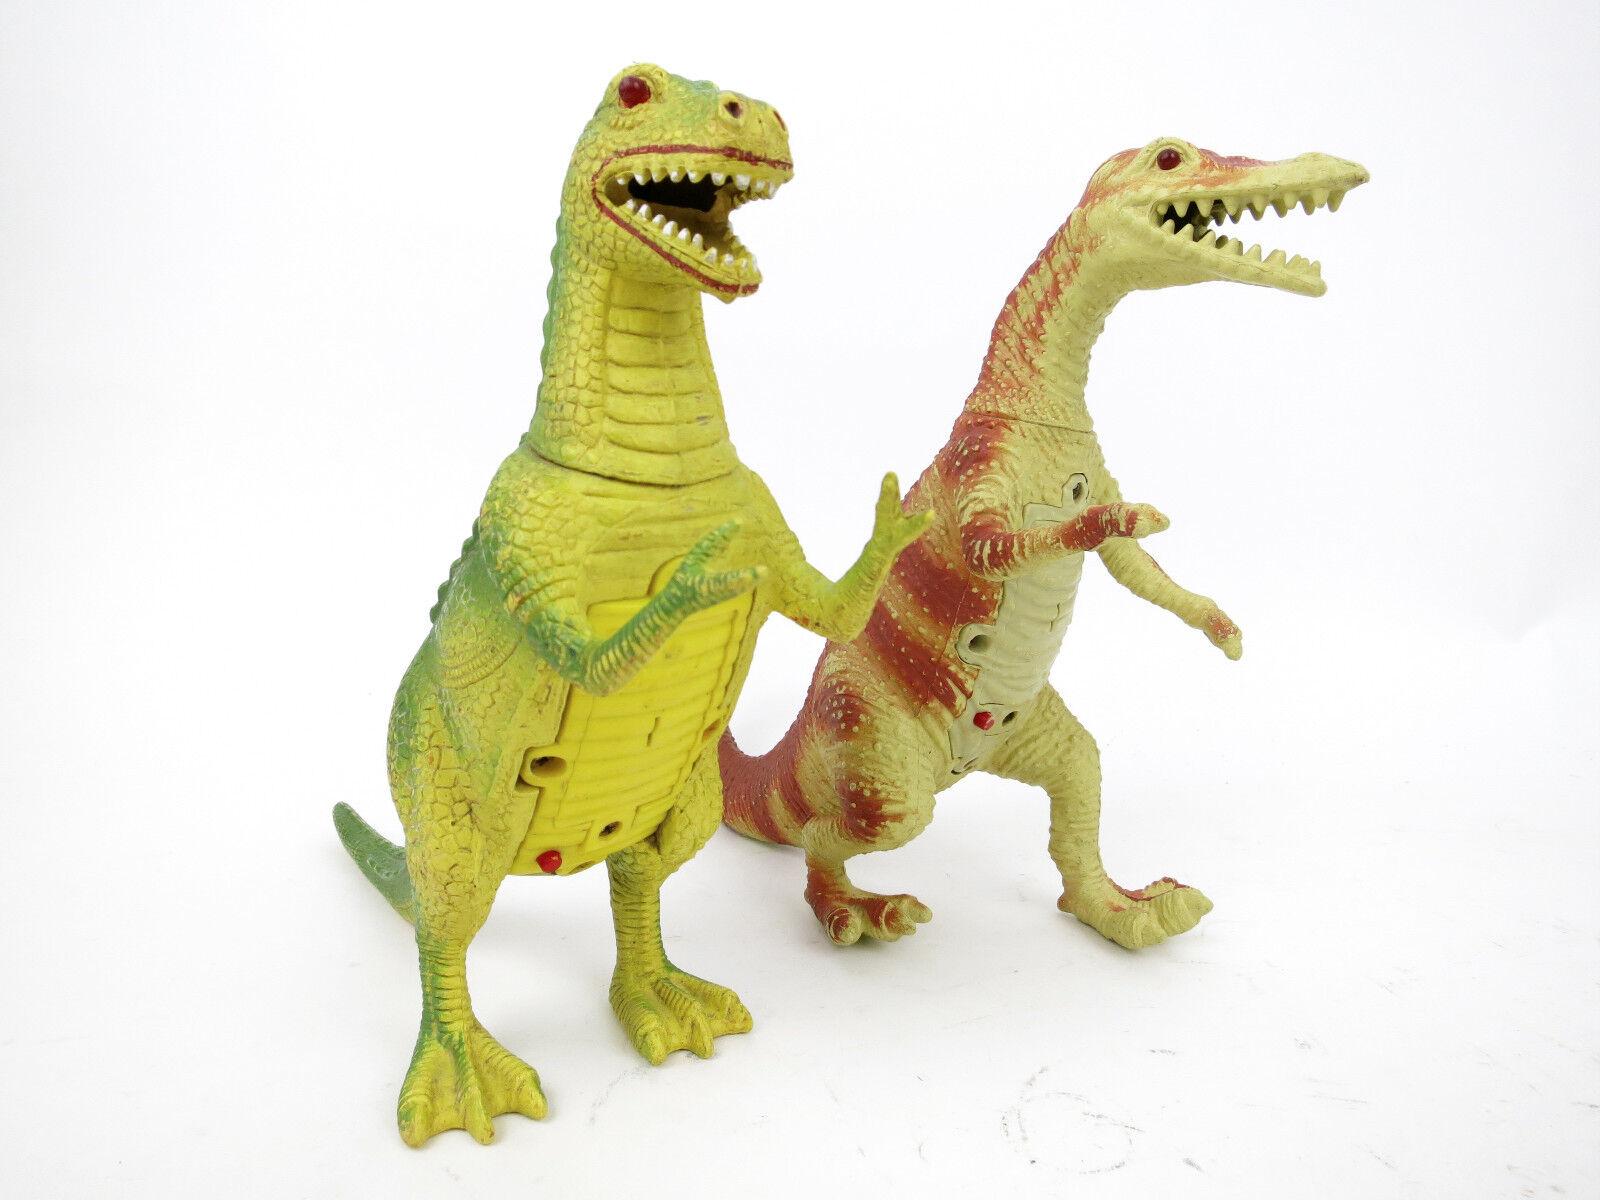 Vintage 1990s Imperial Tyrannosaurus T Rex Dinosaur Toy Battery Op Figure Parts